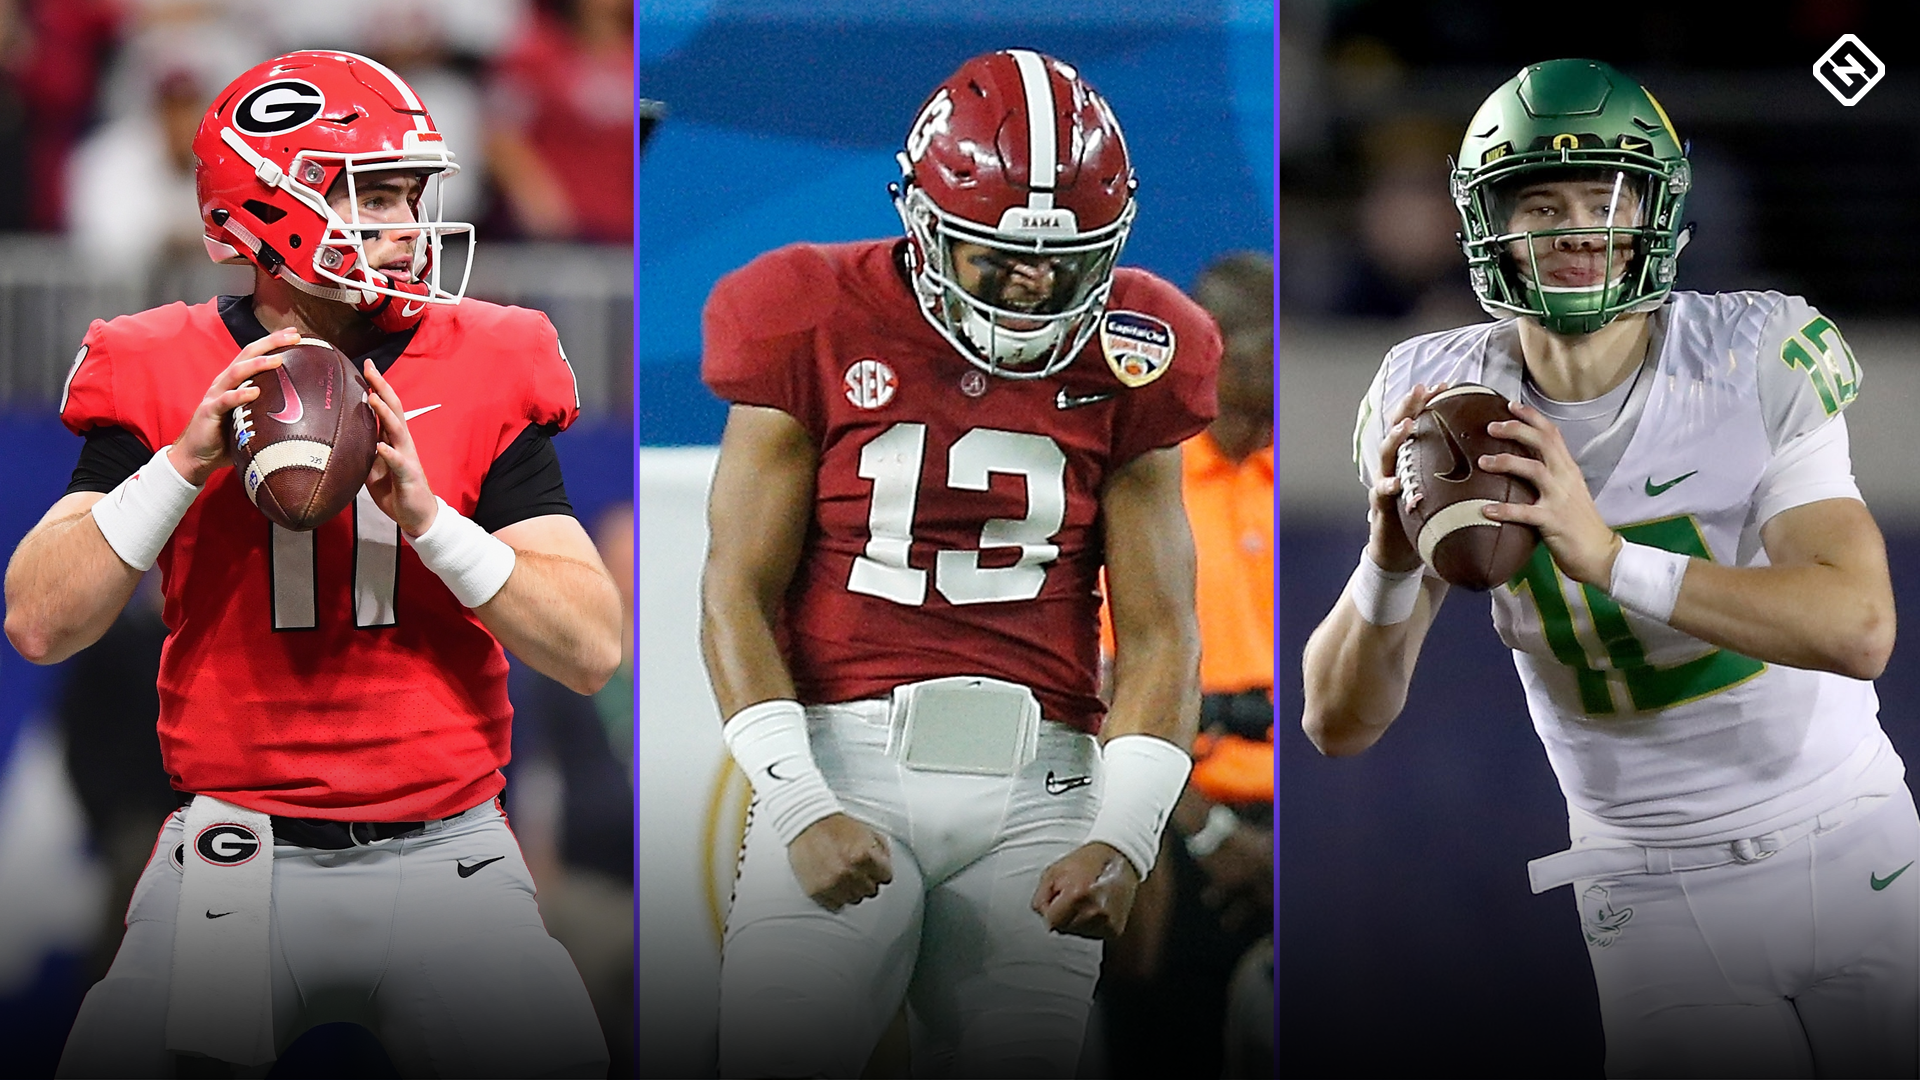 Best Quarterbacks 2020 Top 10 QBs for 2020 NFL Draft: Tua Tagovailoa, Justin Herbert lead